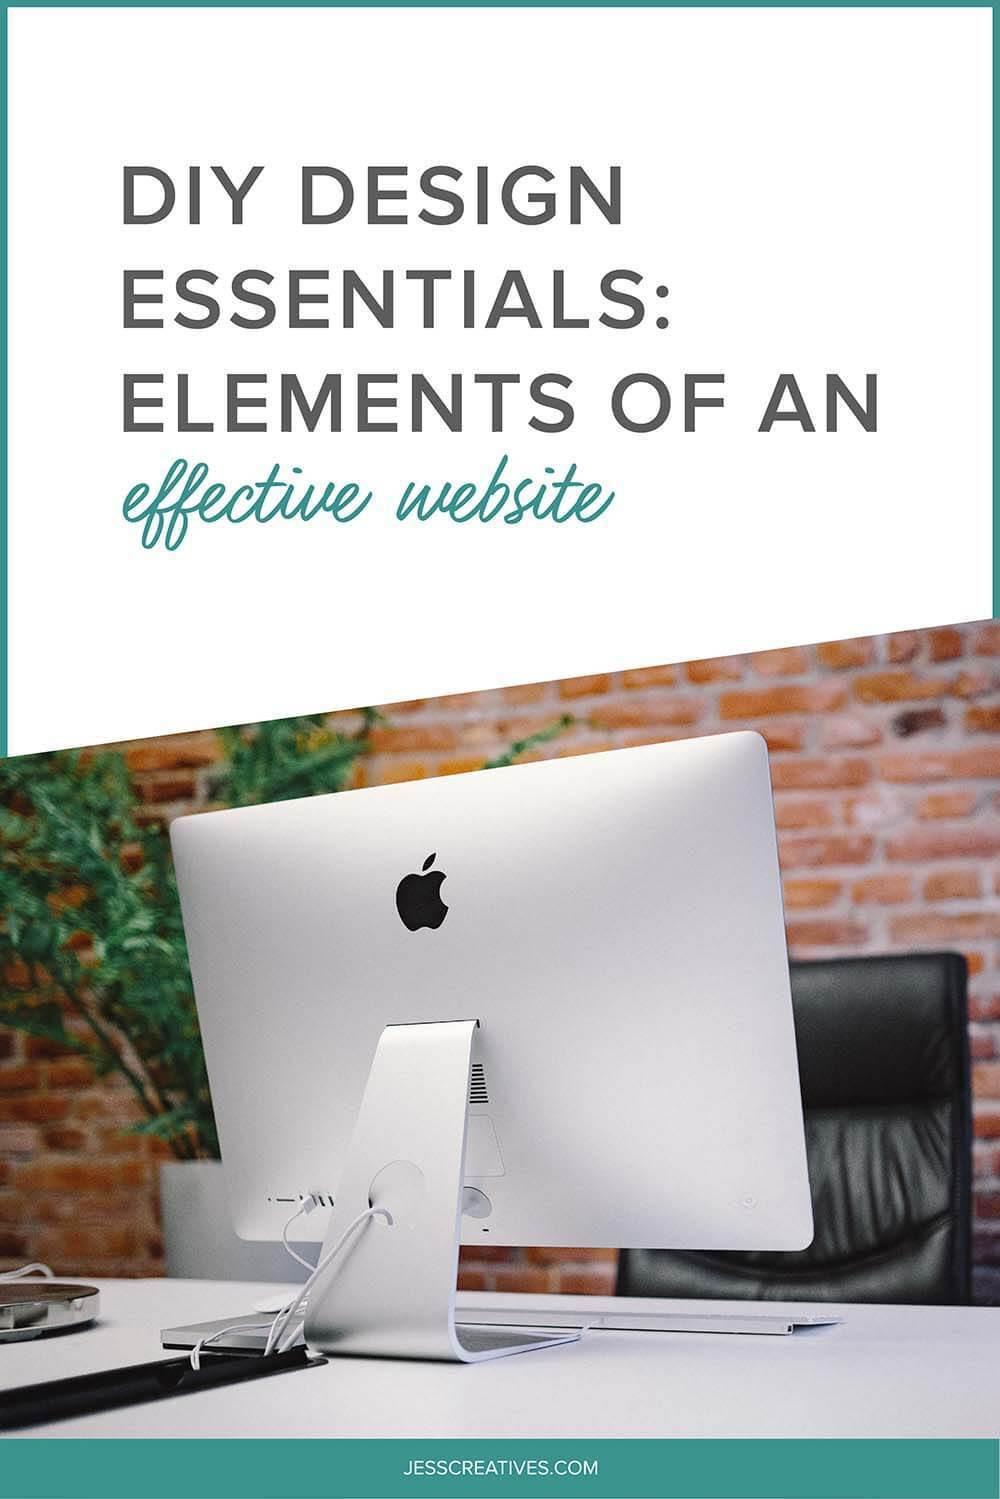 Best ideas about DIY Website Design . Save or Pin DIY Design Essentials Elements of an Effective Website Now.